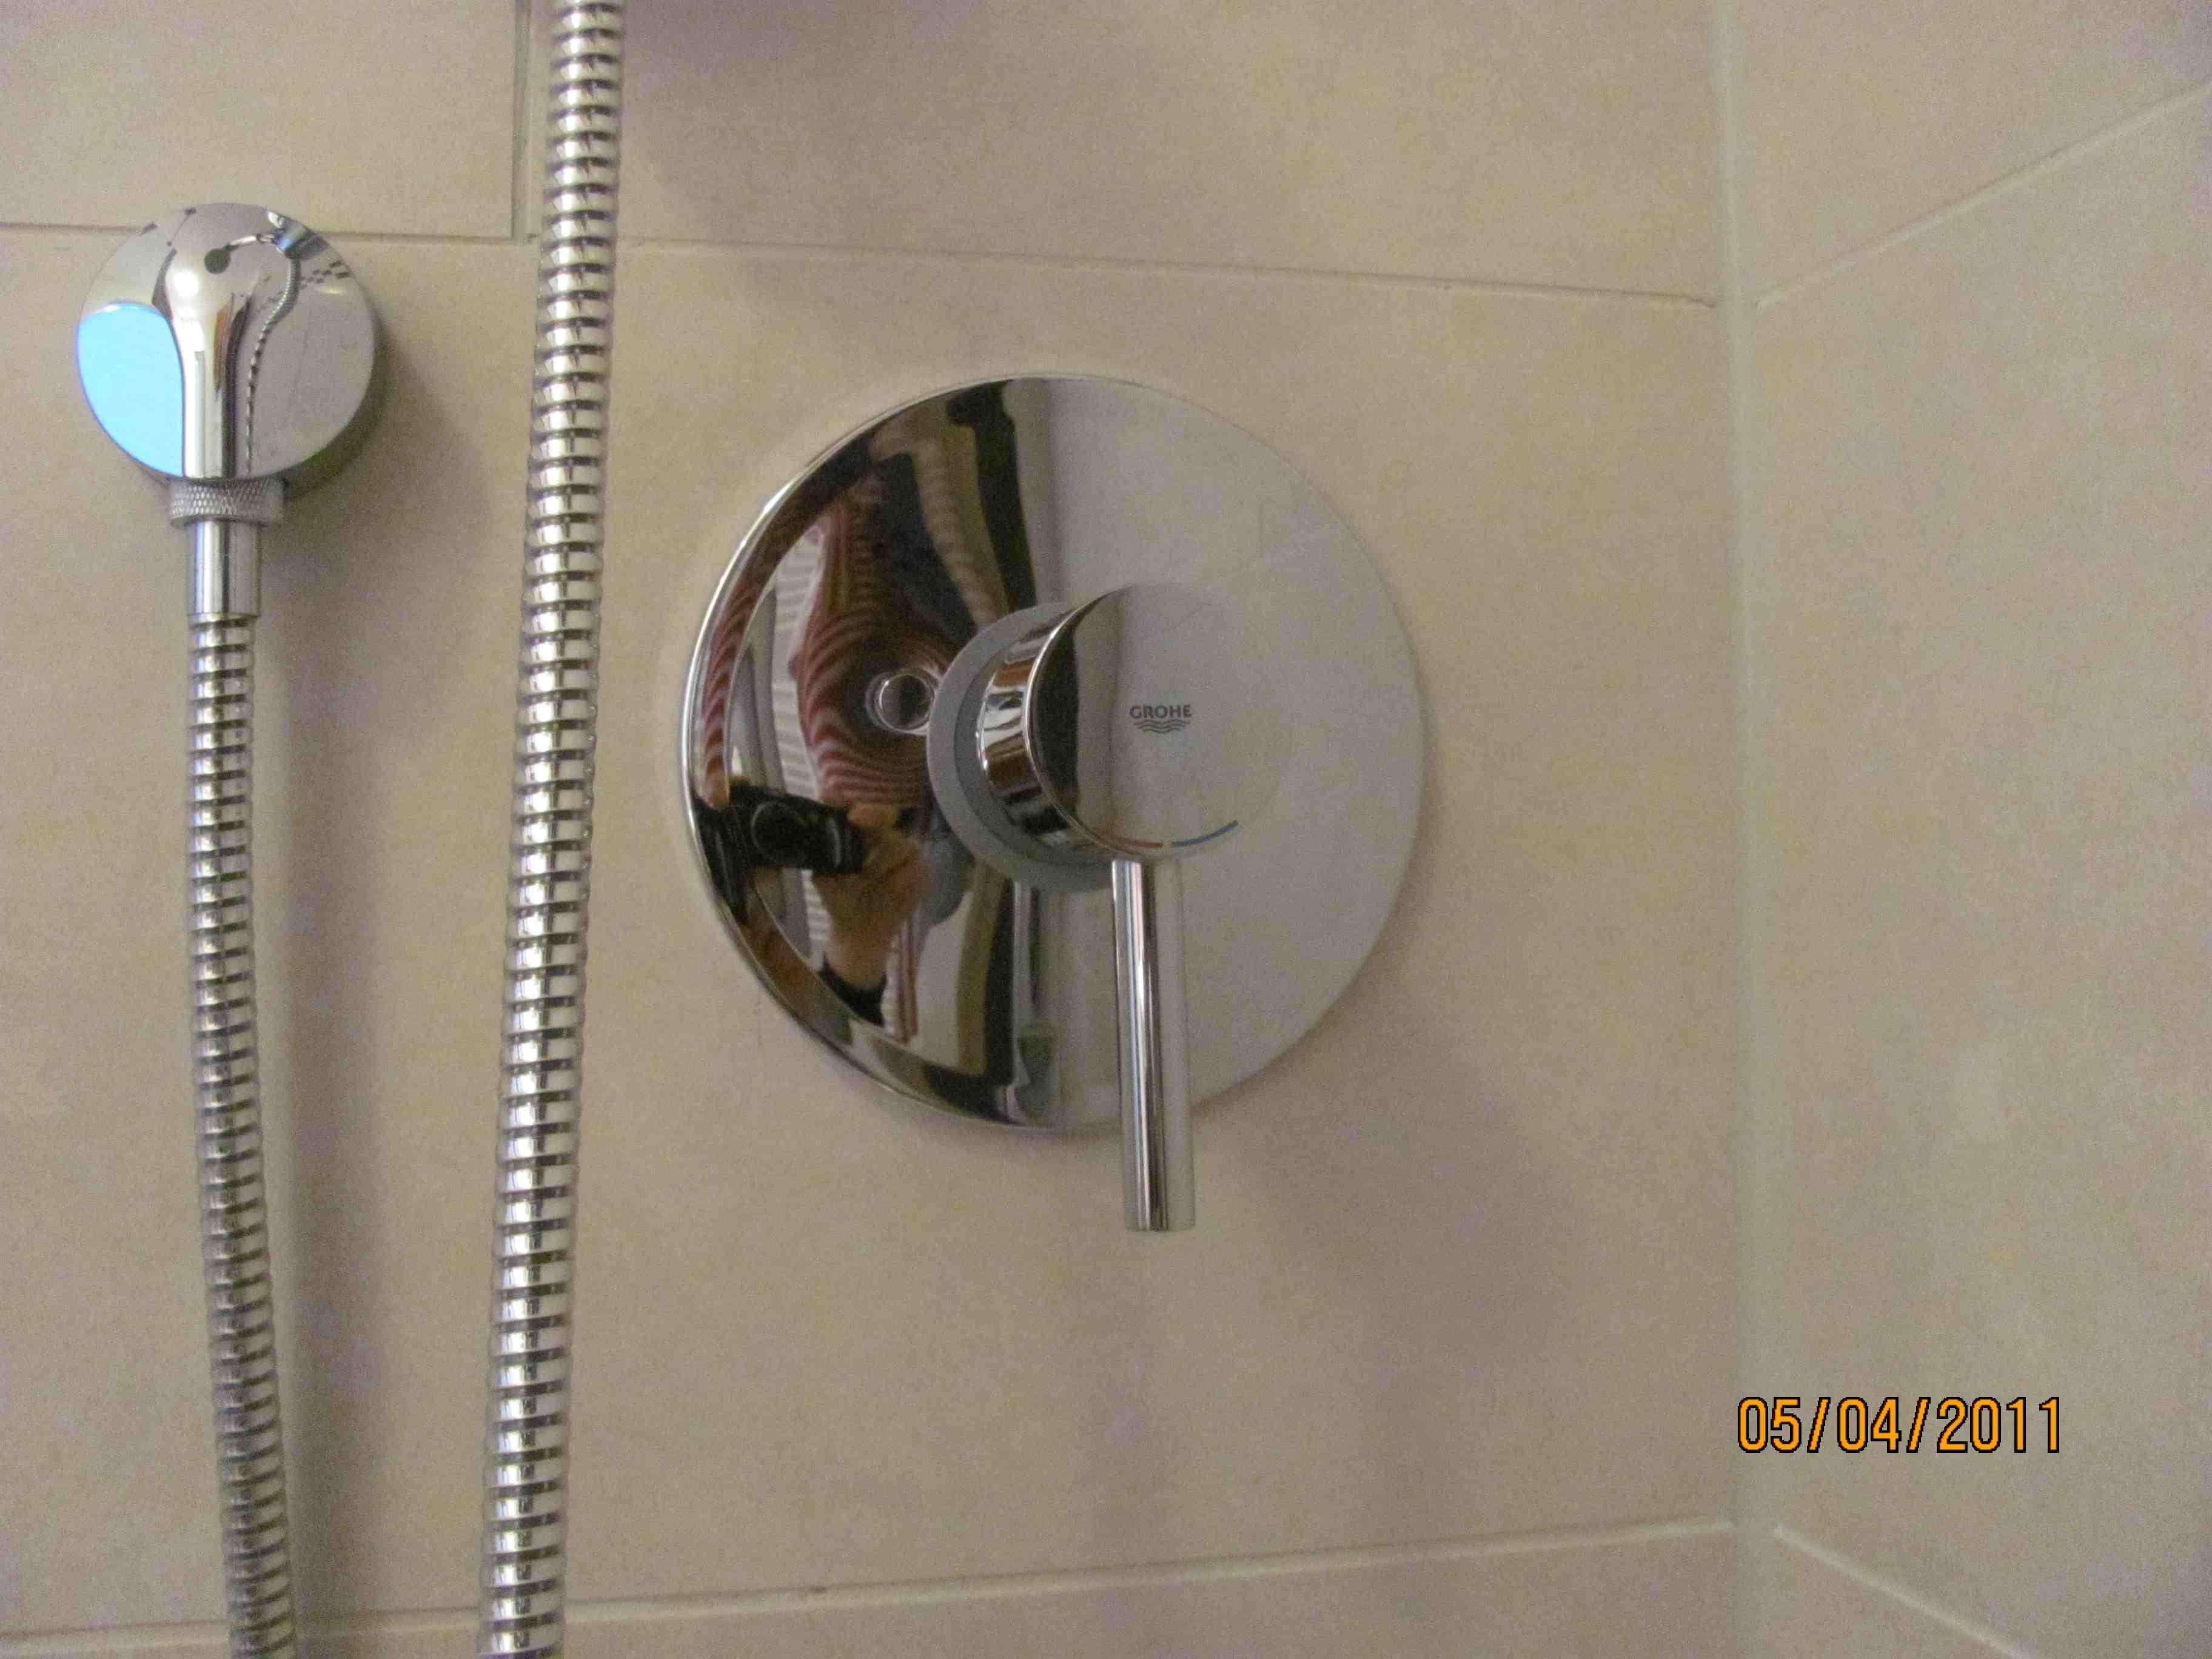 Neu Badewannenarmatur Umschalter Reparieren Ideen